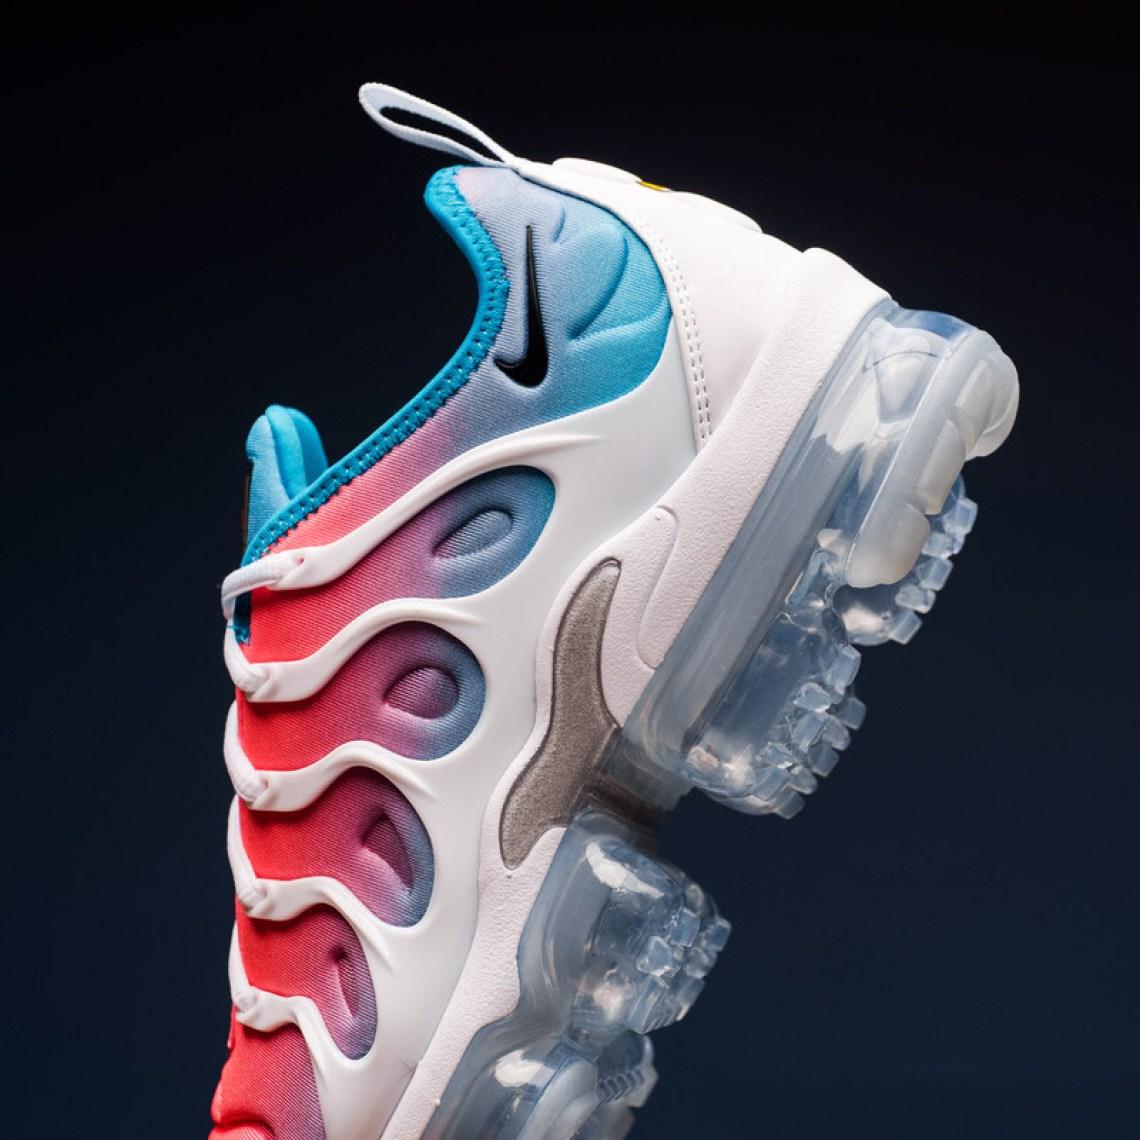 Nike WMNS VaporMax Plus